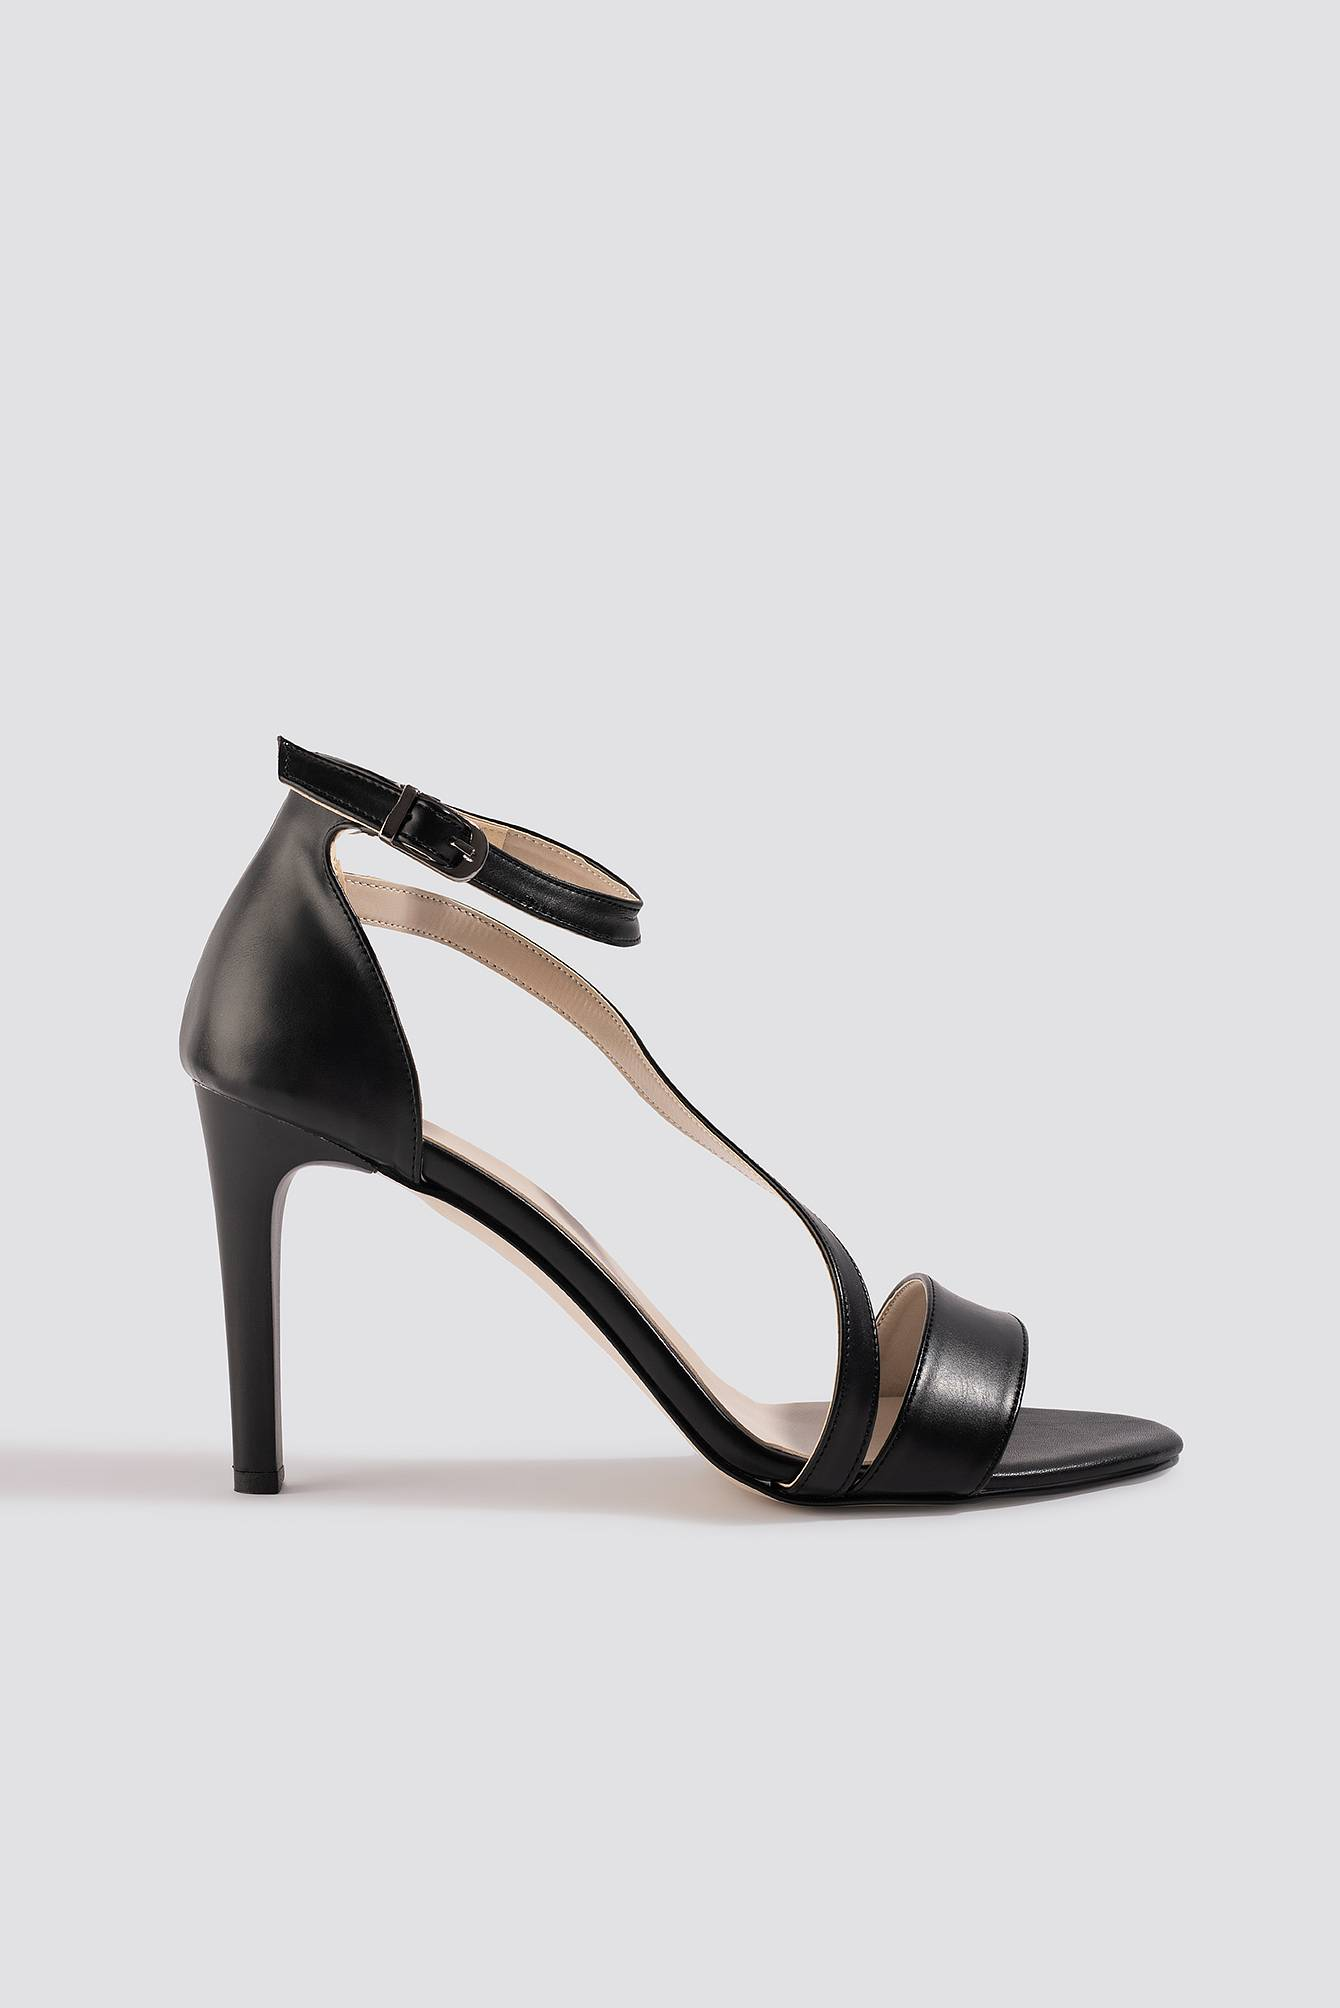 Trendyol Kadin High Heels - Black